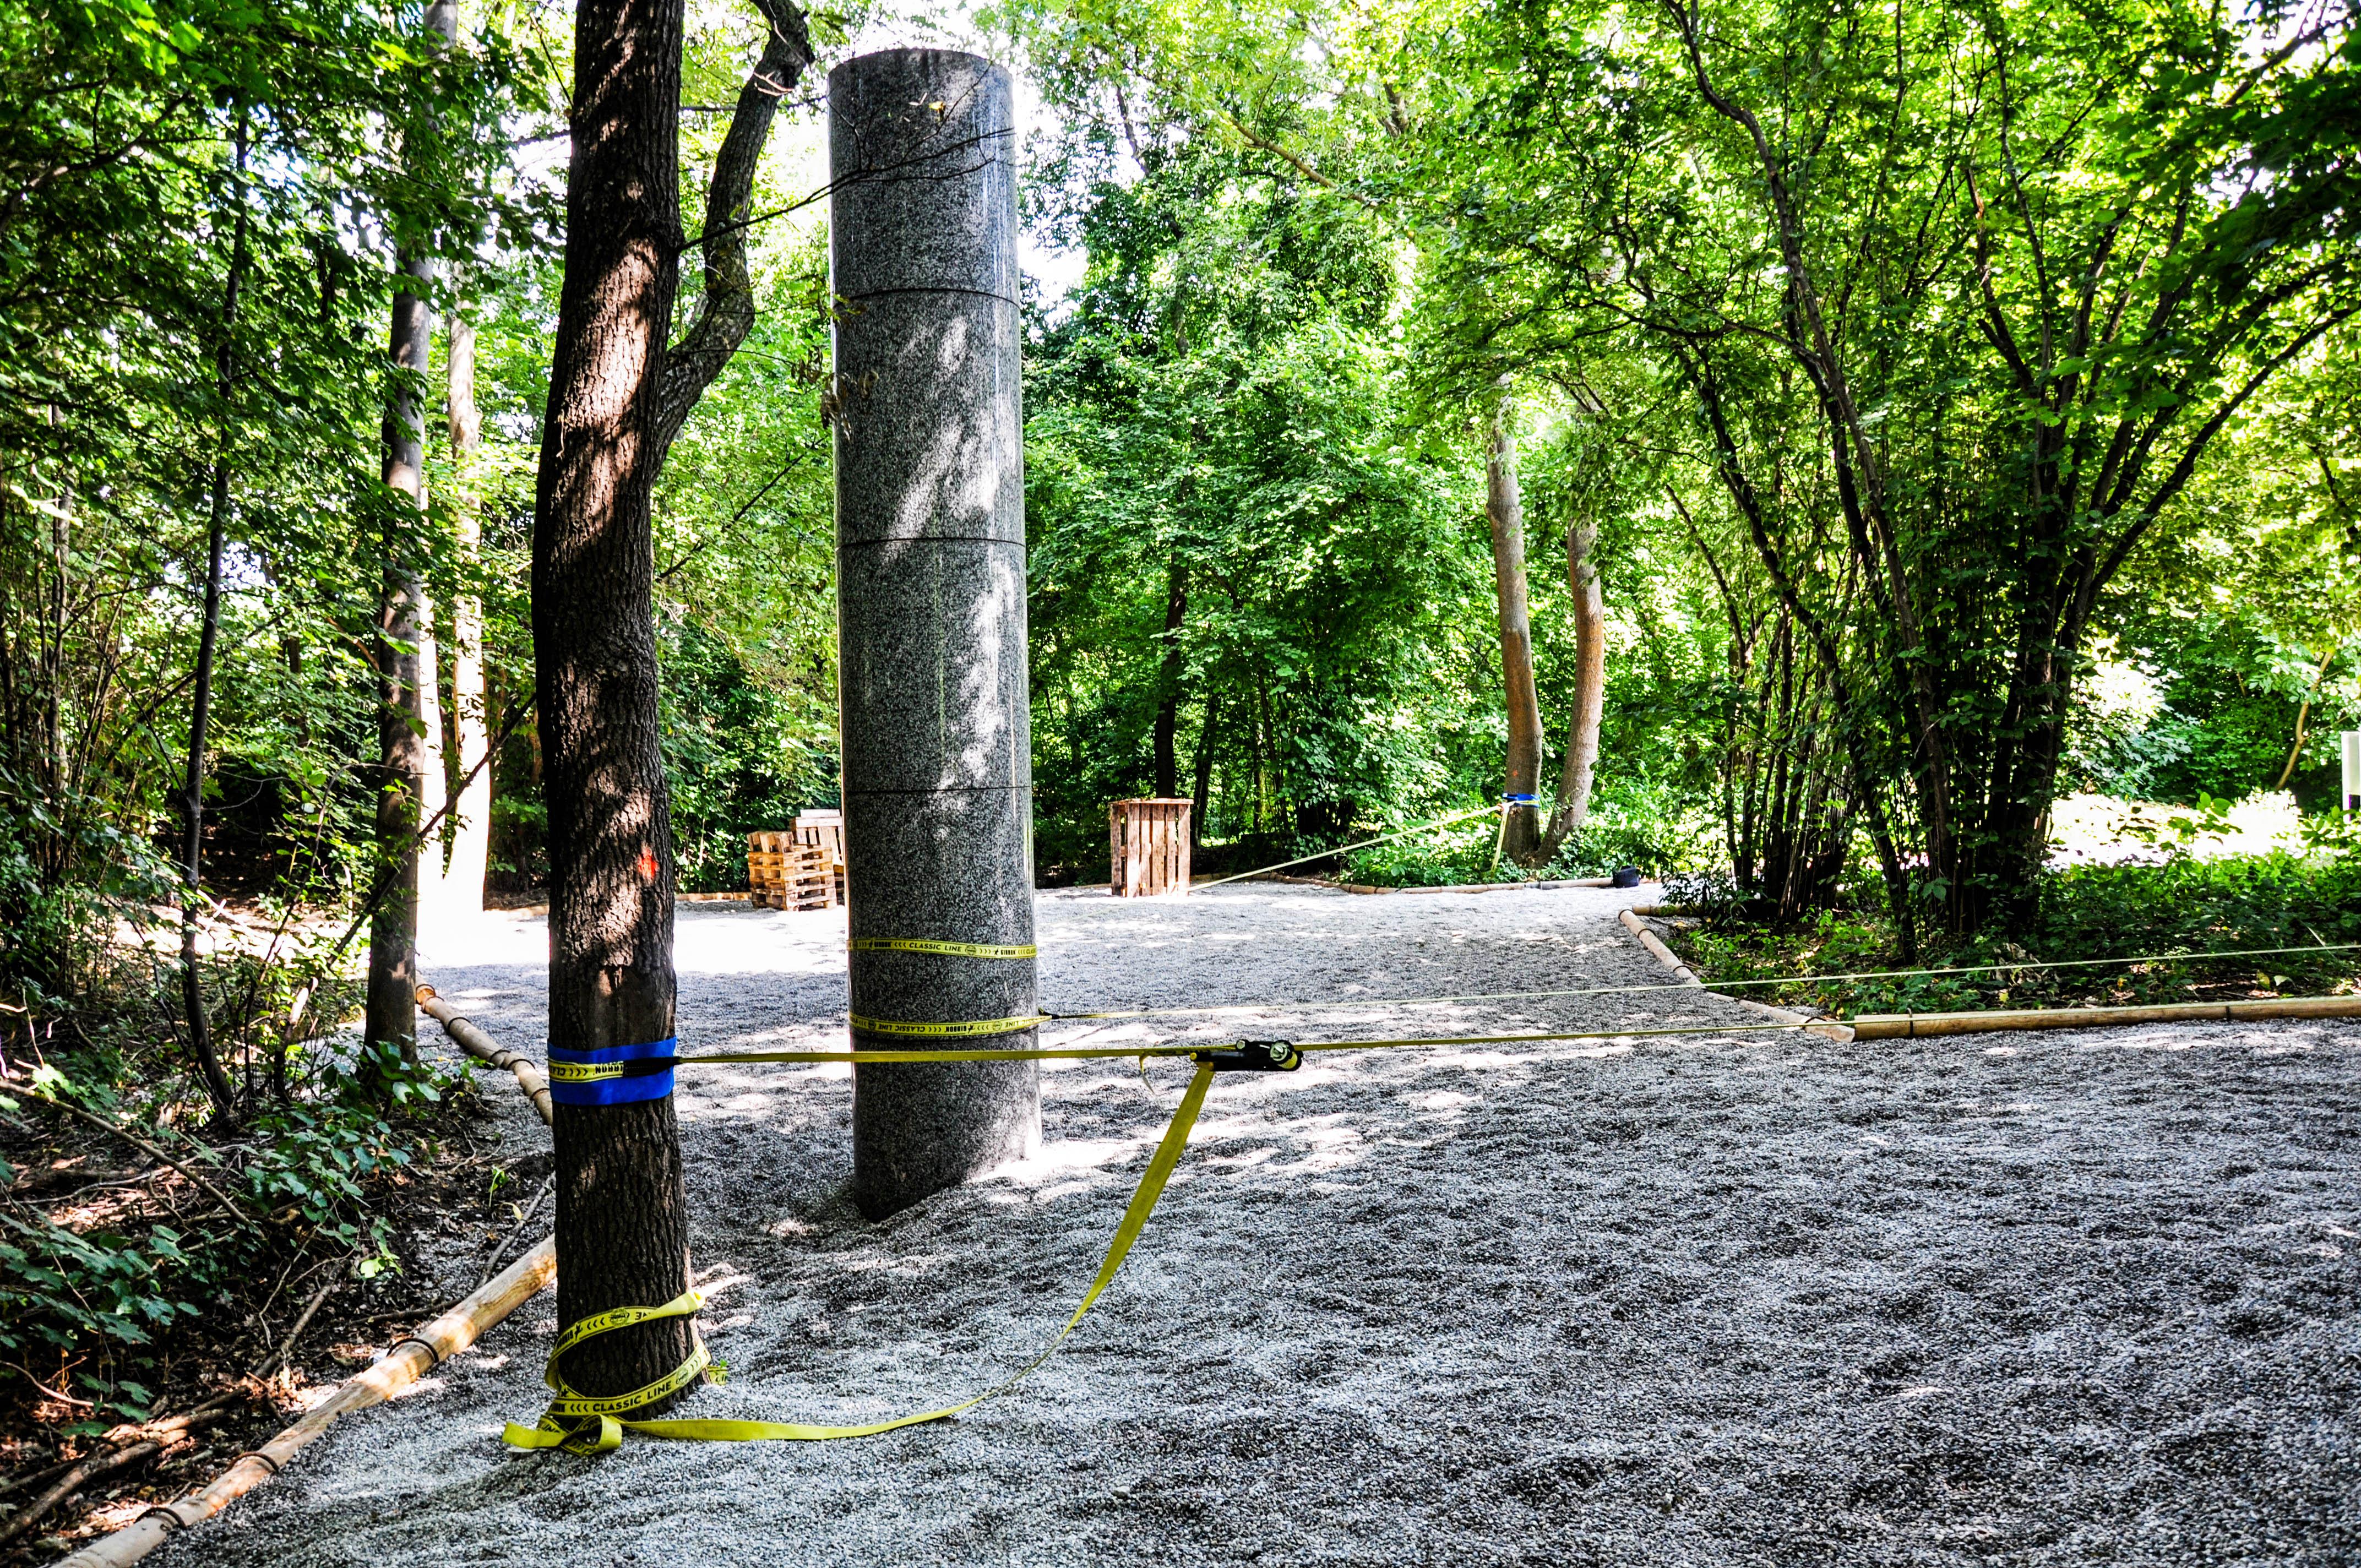 Slackline park